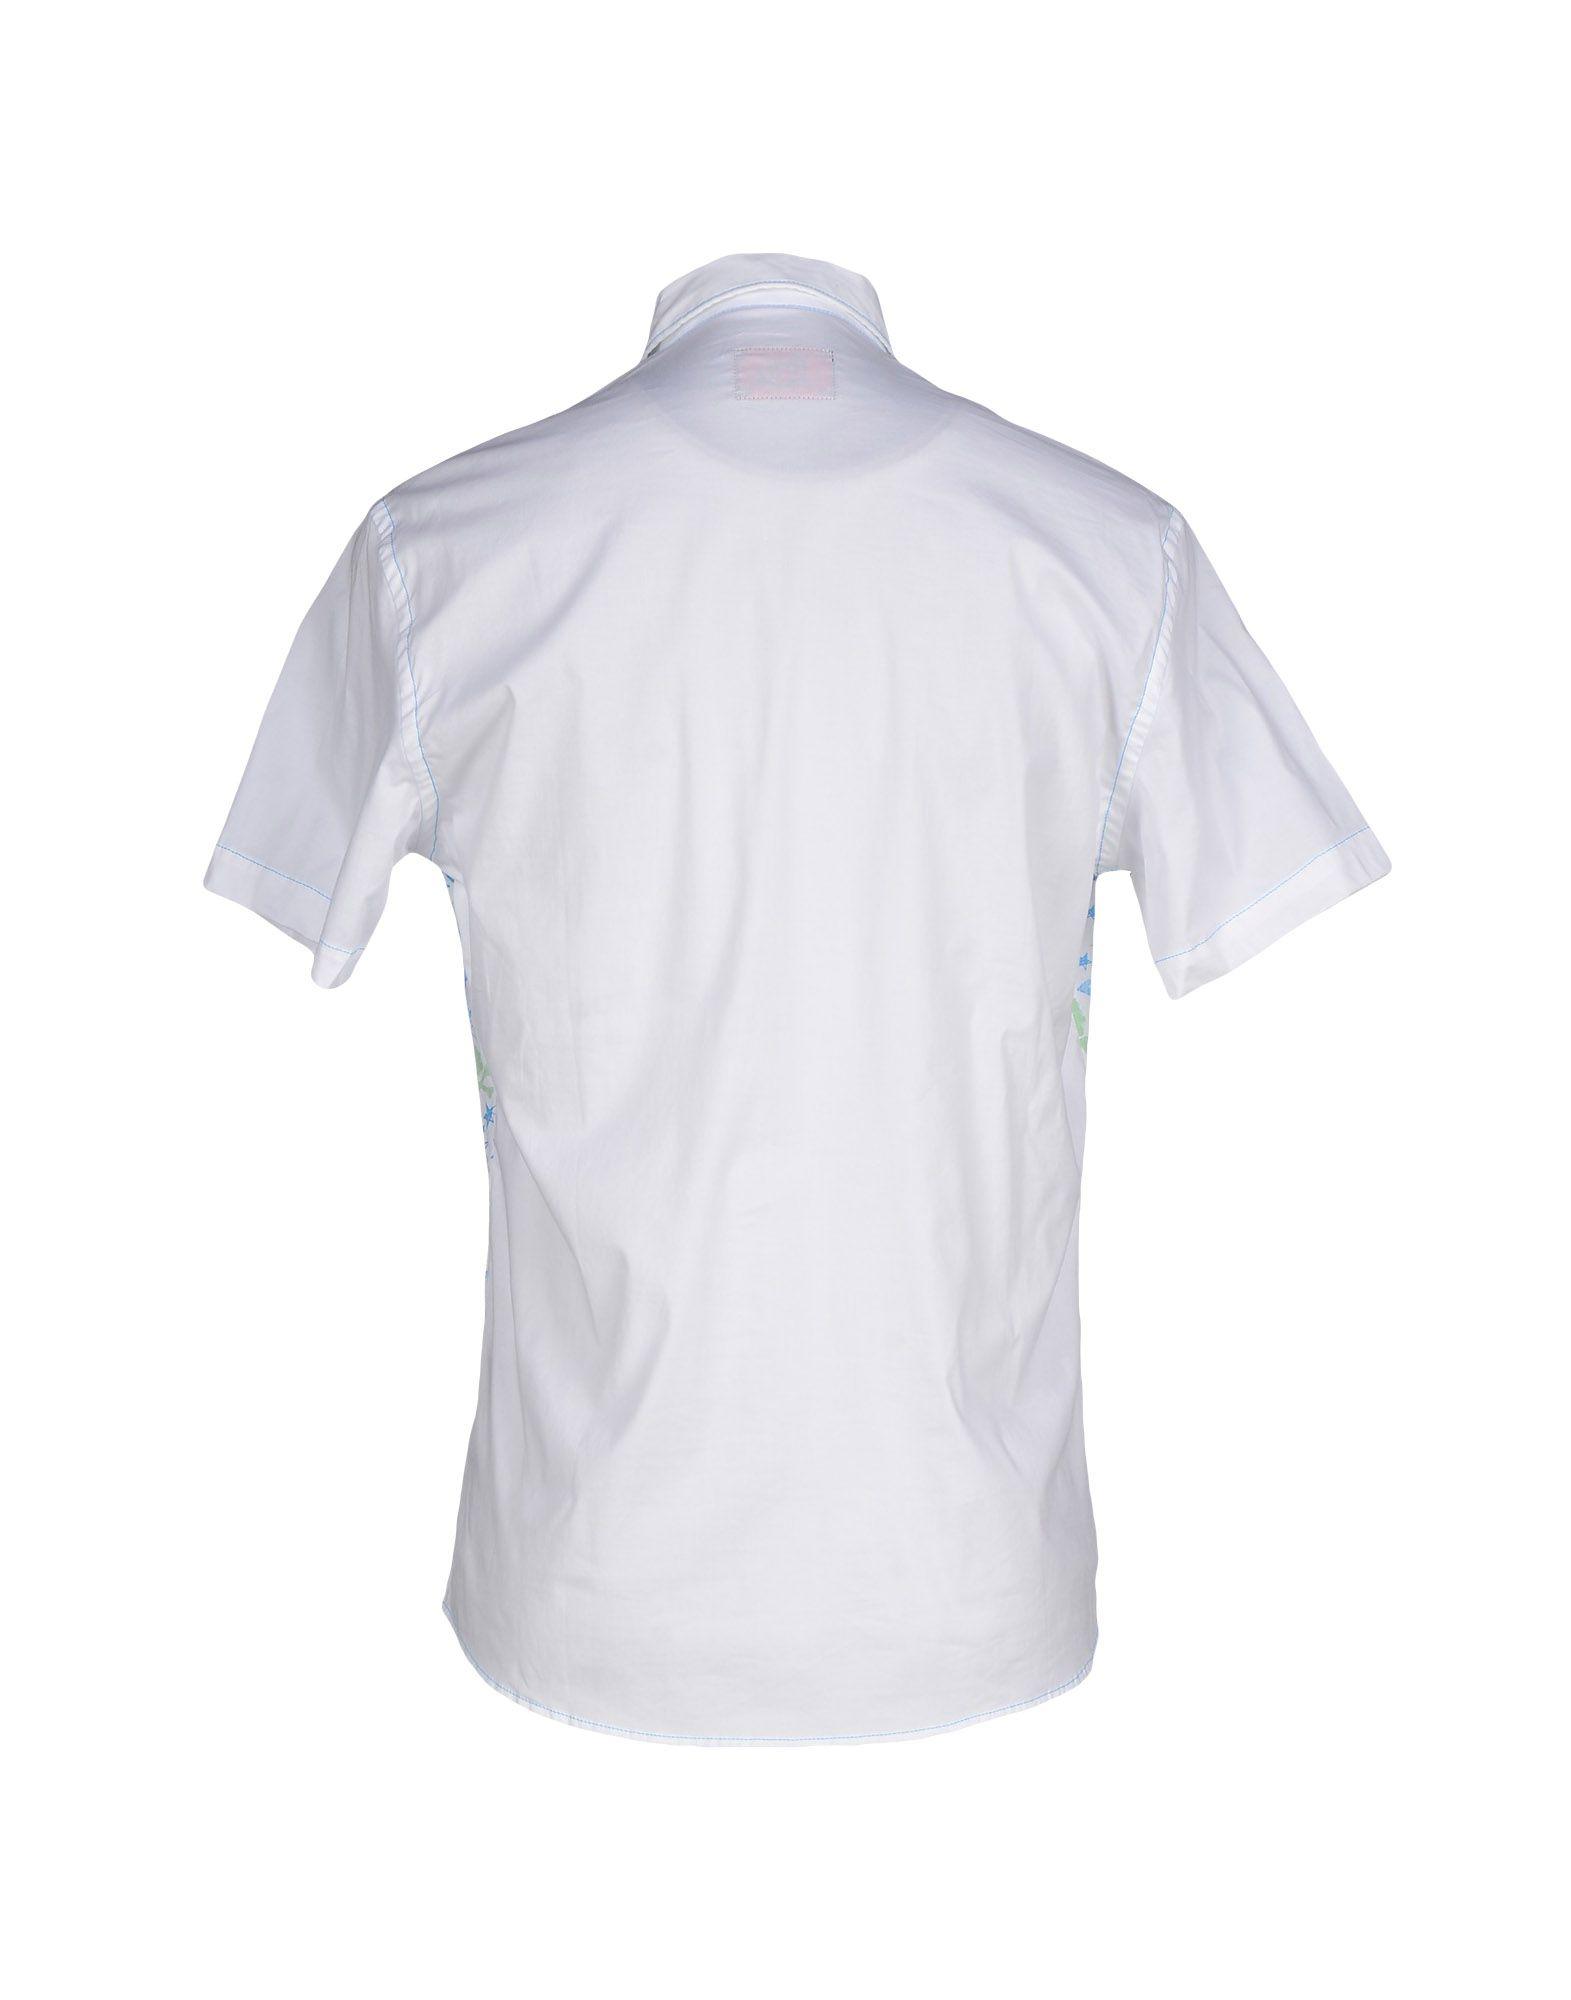 43453de88908 Evisu Shirt in White for Men - Lyst